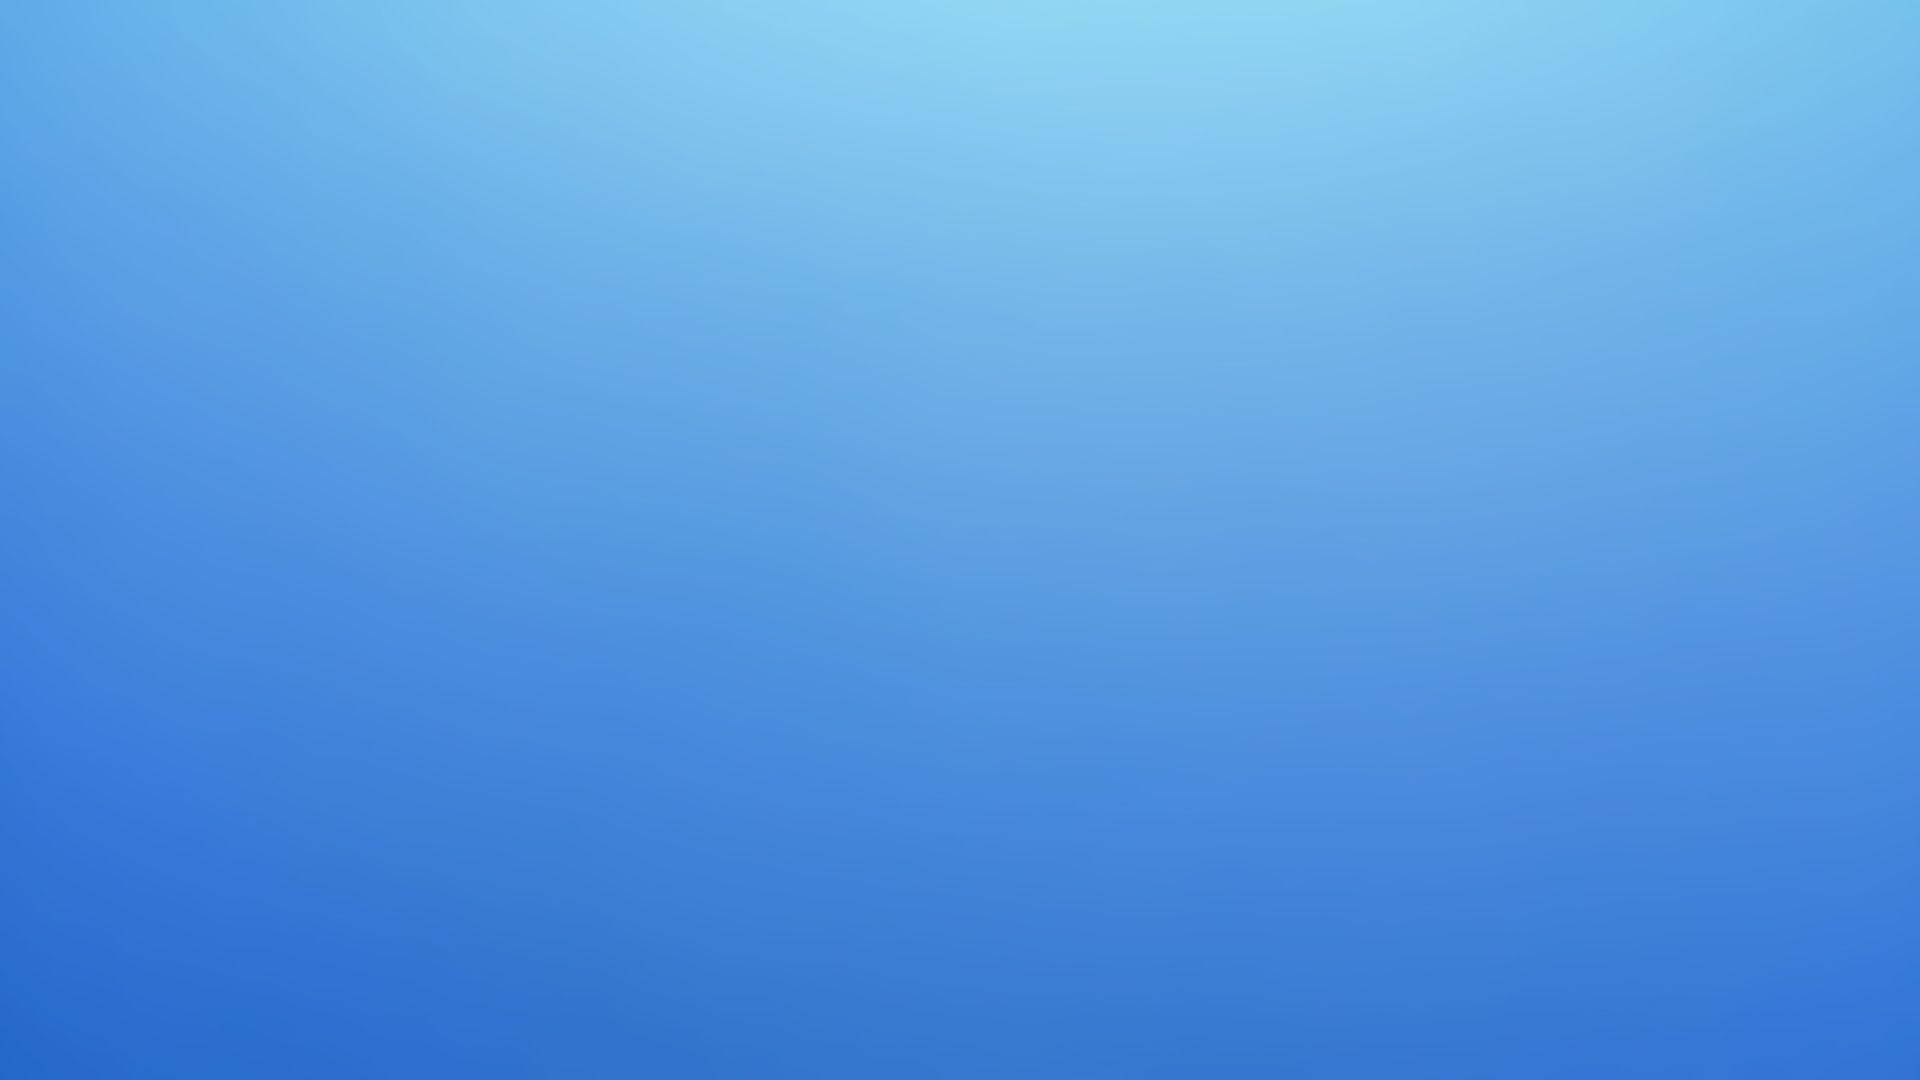 Plain Blue a wallpaper